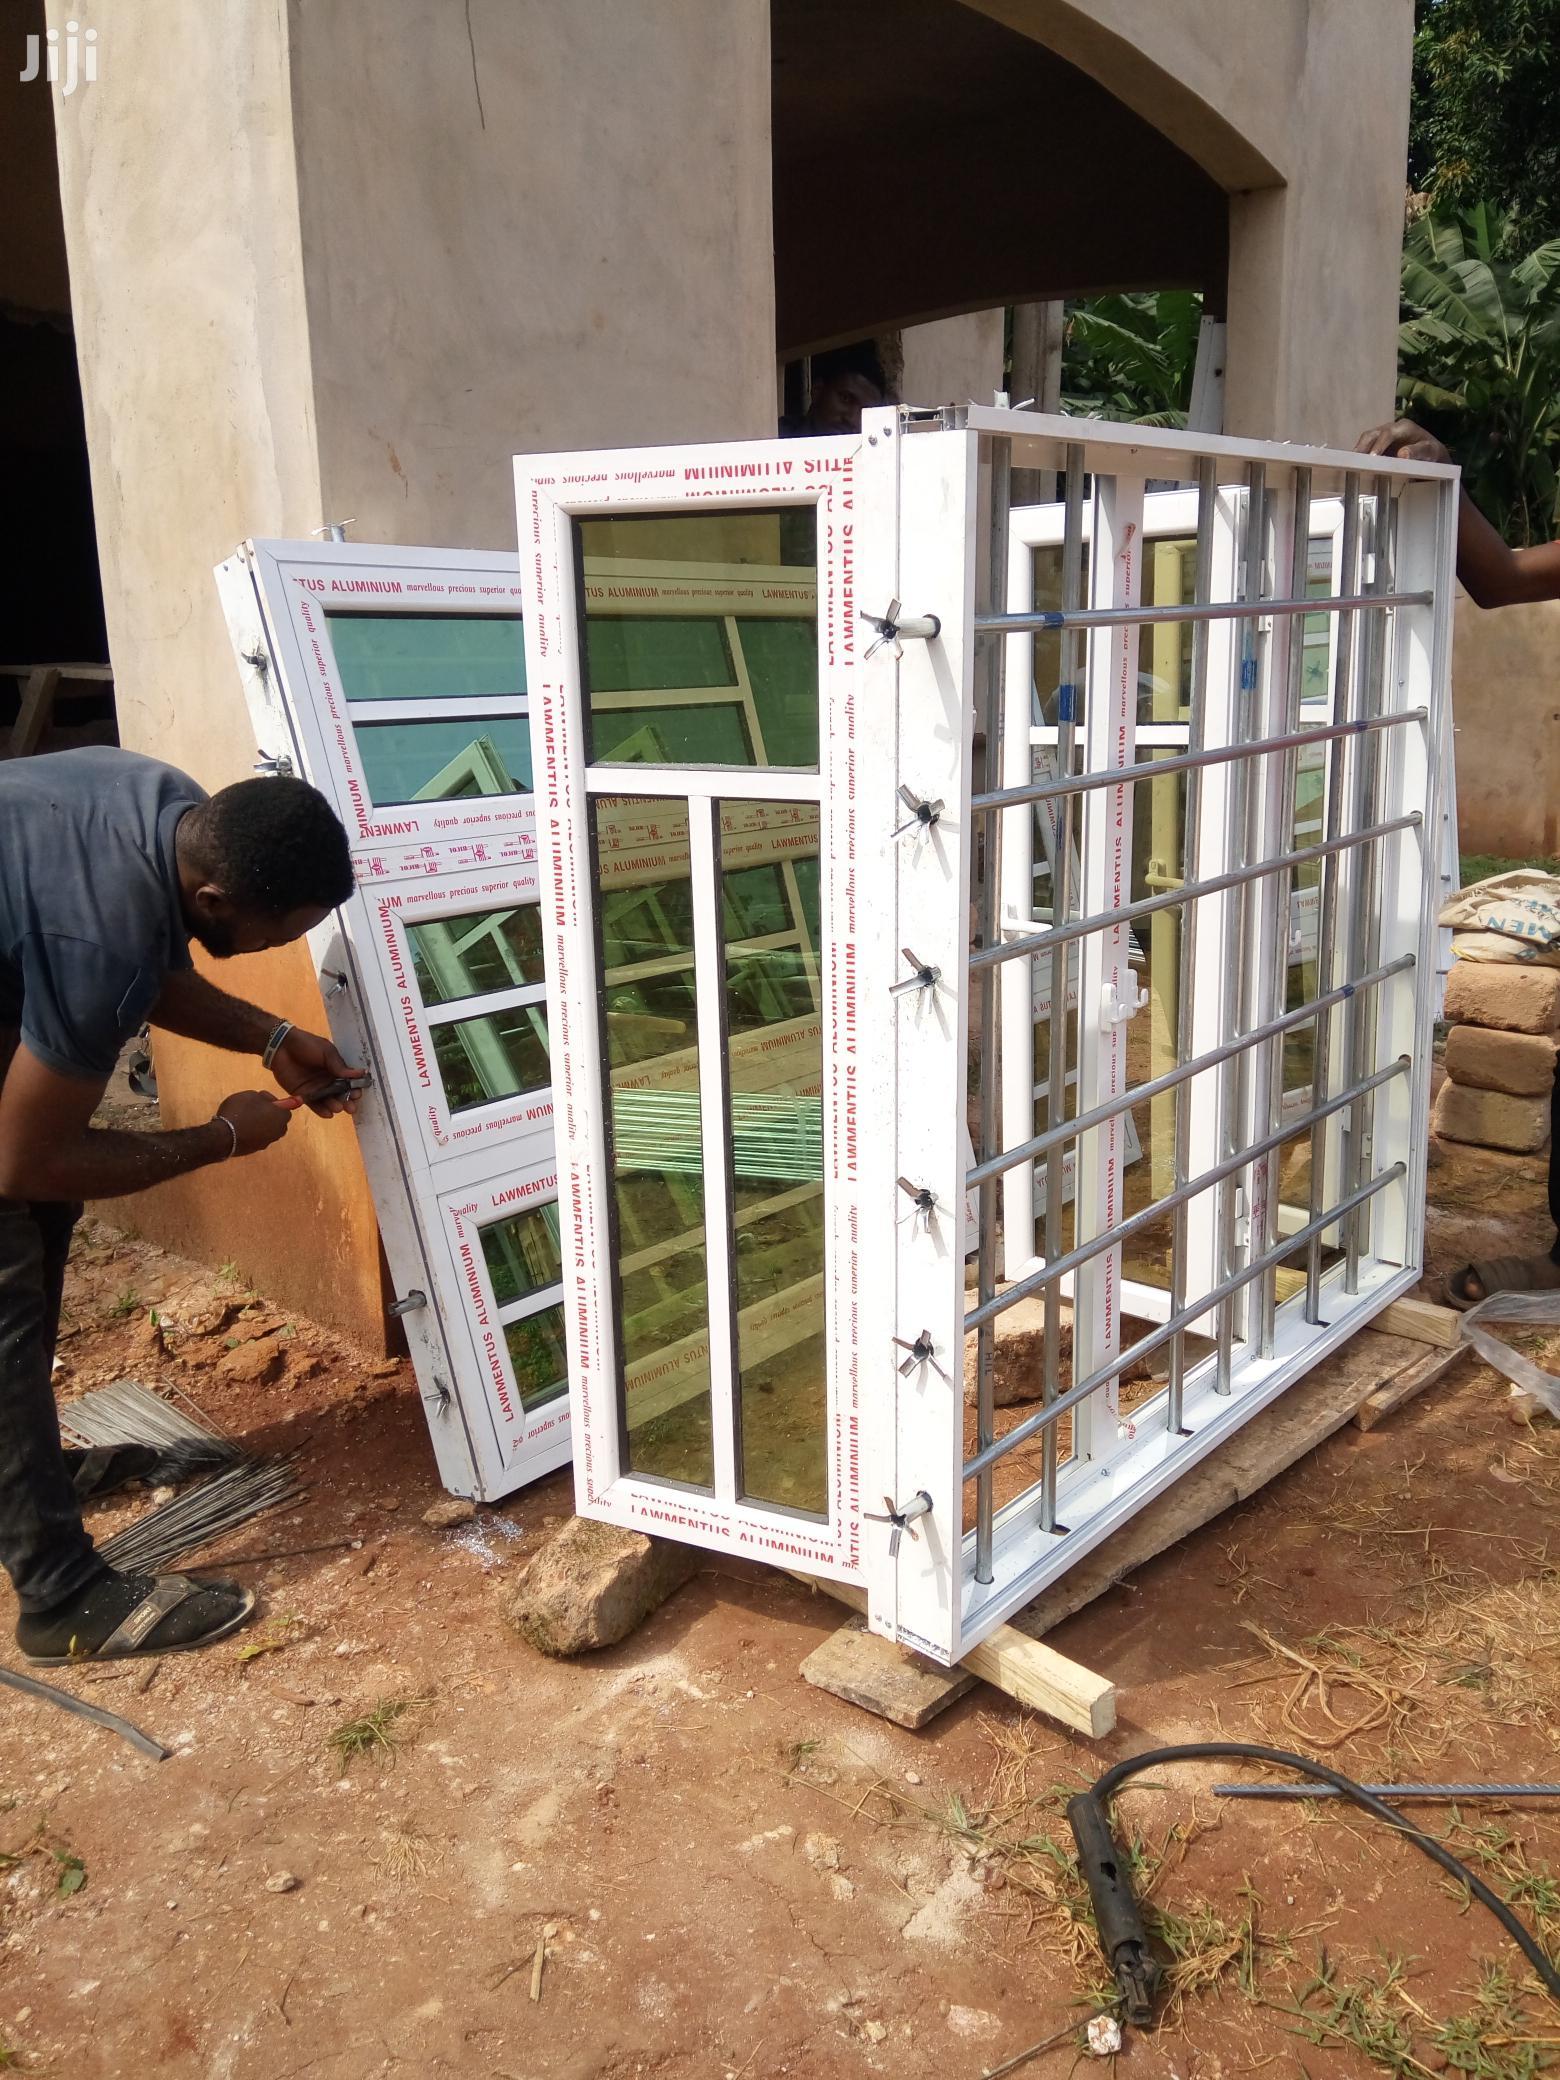 Casement Windows With Burglary Proof and Net